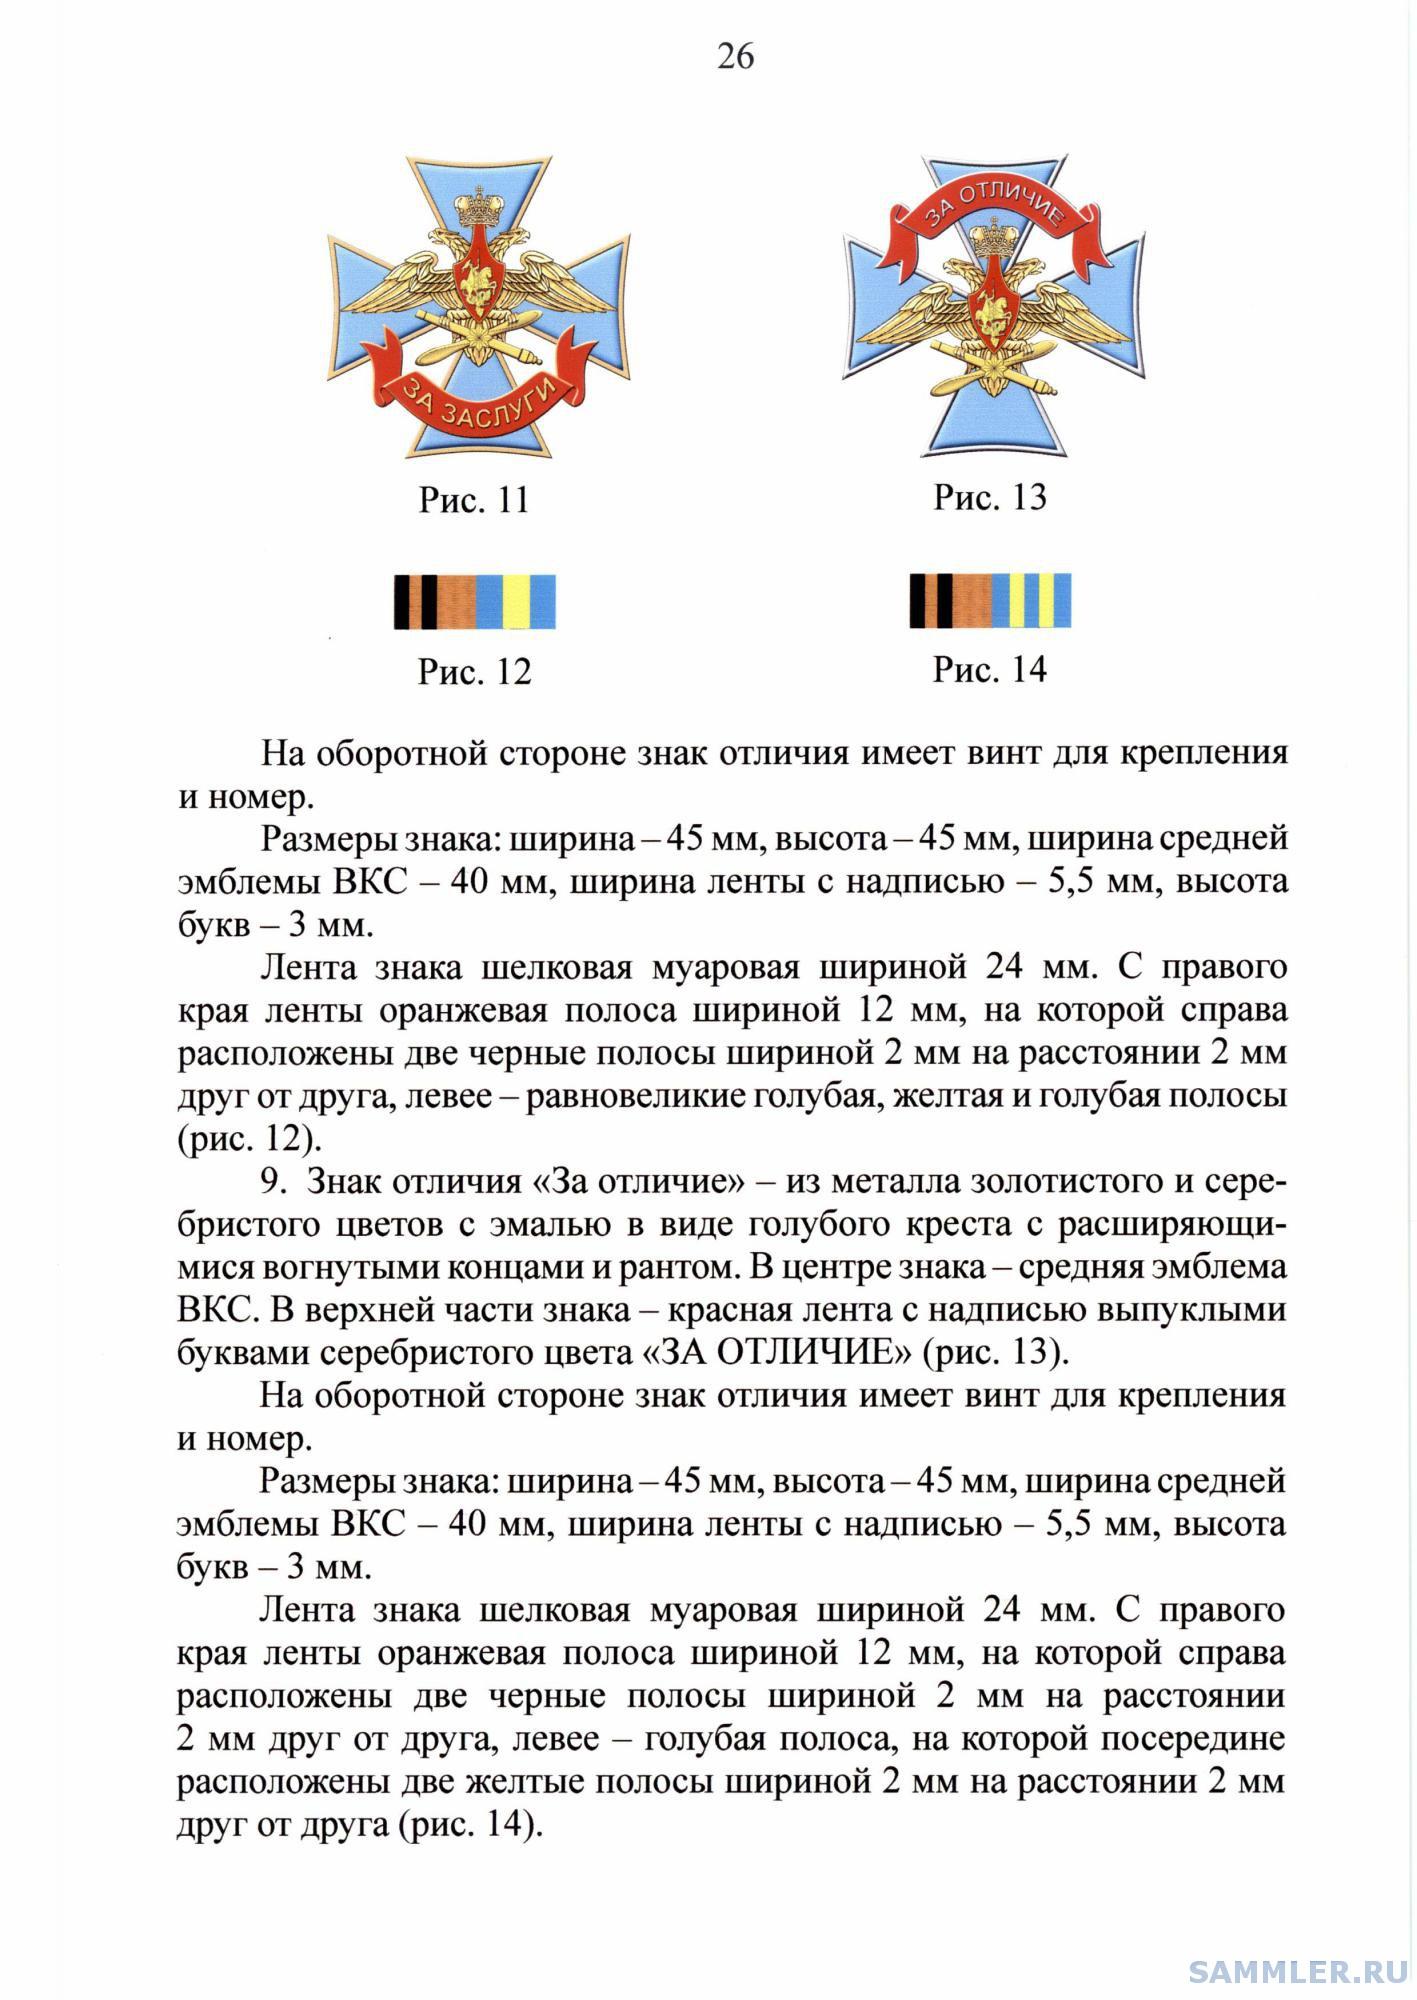 МО РФ 470(цвет)-26.jpg